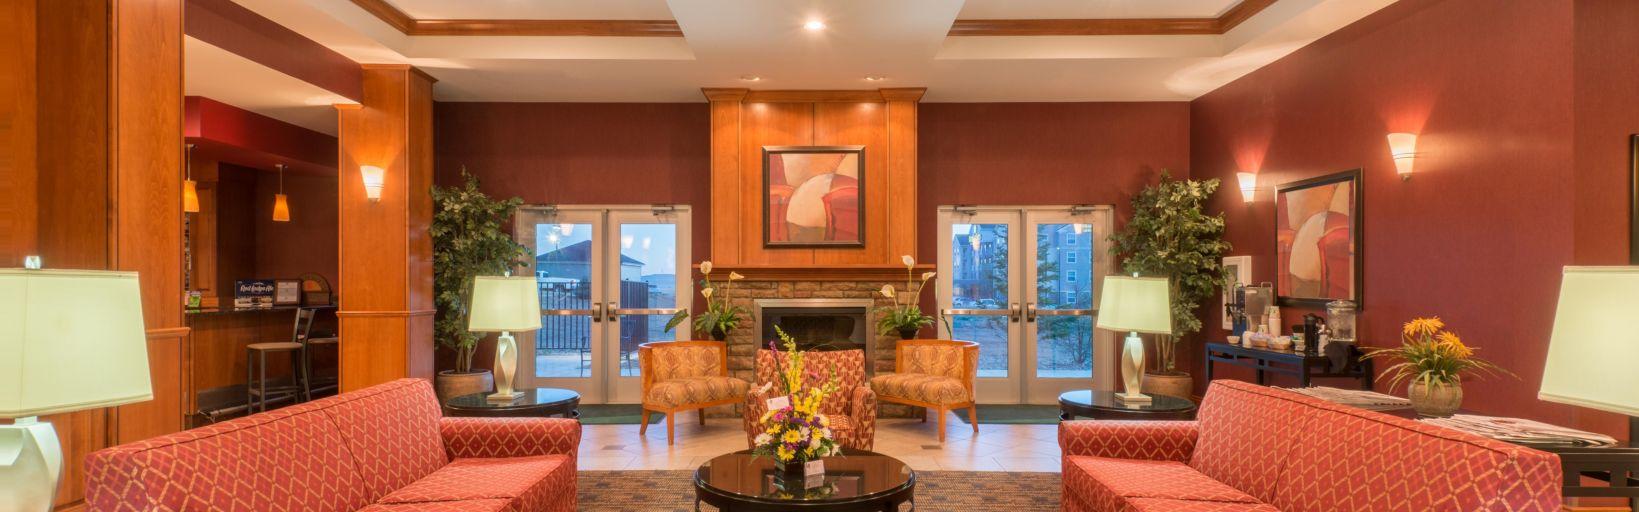 Holiday Inn Casper East - McMurry Park Hotel by IHG